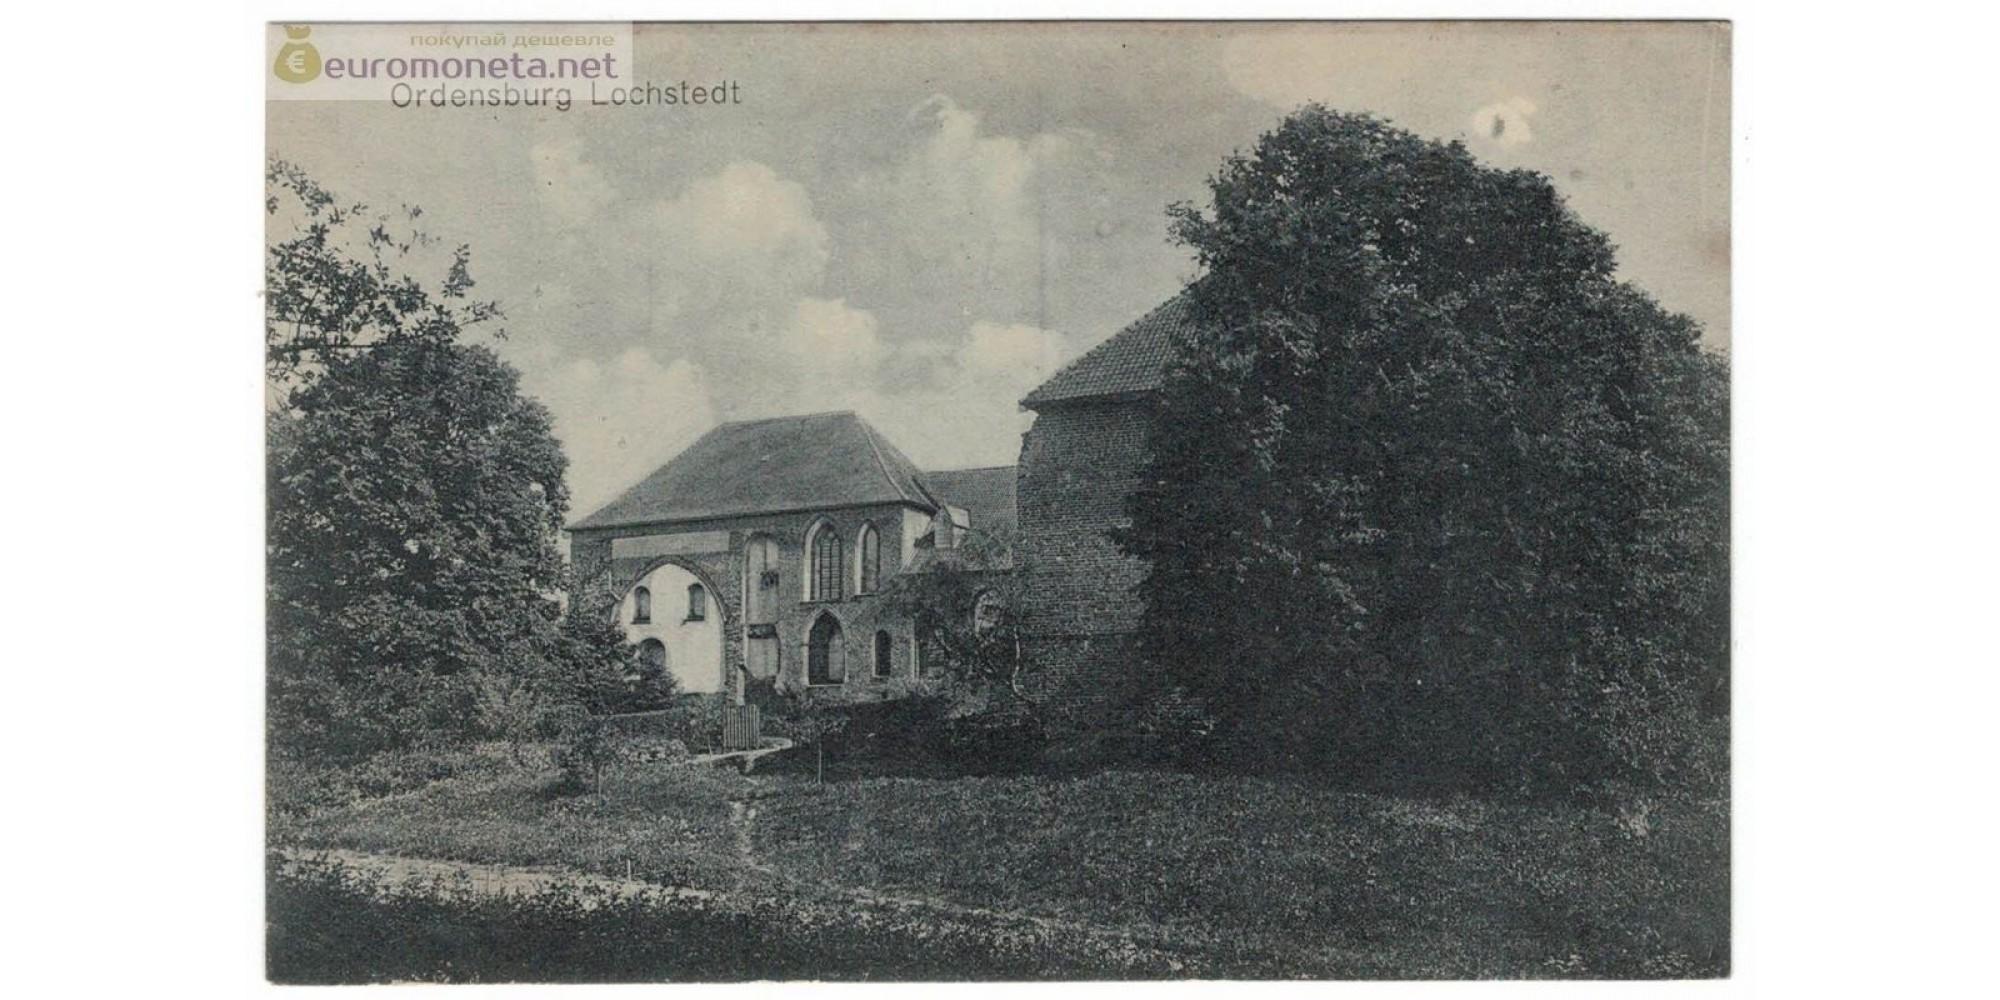 Открытка Пруссия Мальборк Malbork Ordensburg Мариенбург Орденсбург замок